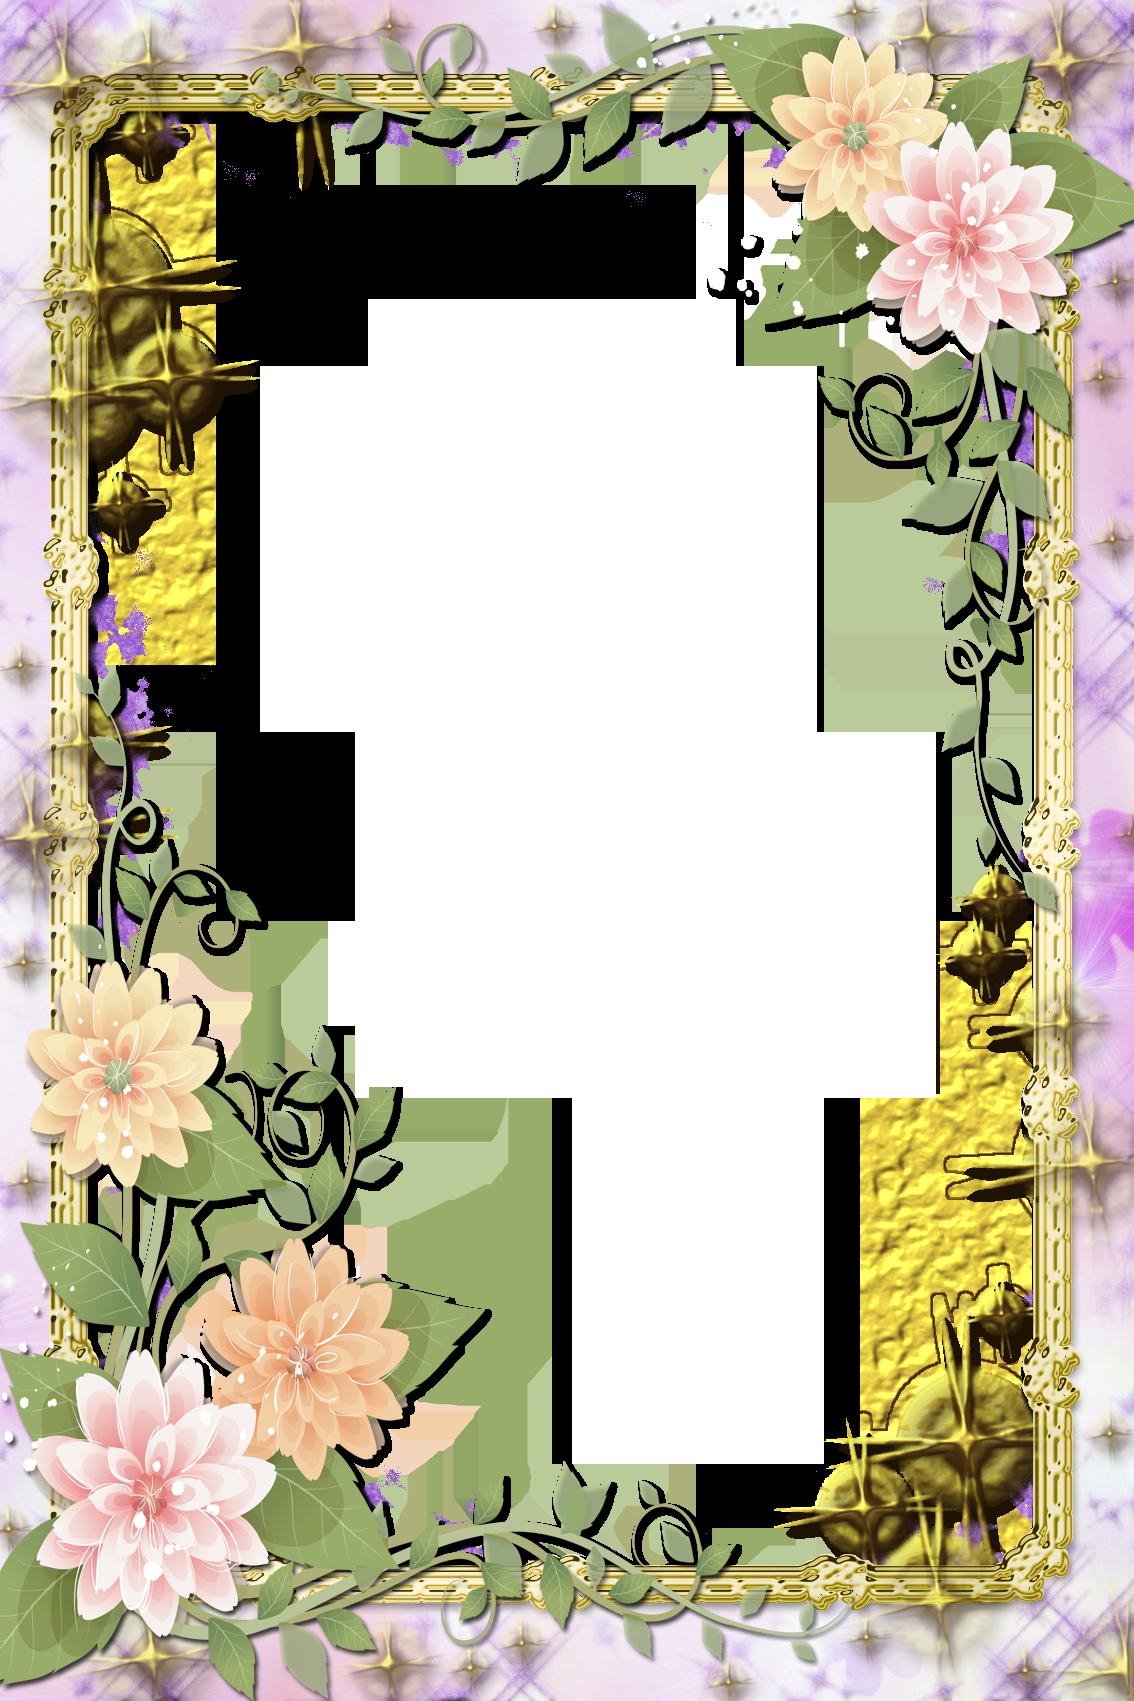 Анимации для, открытки а4 шаблон